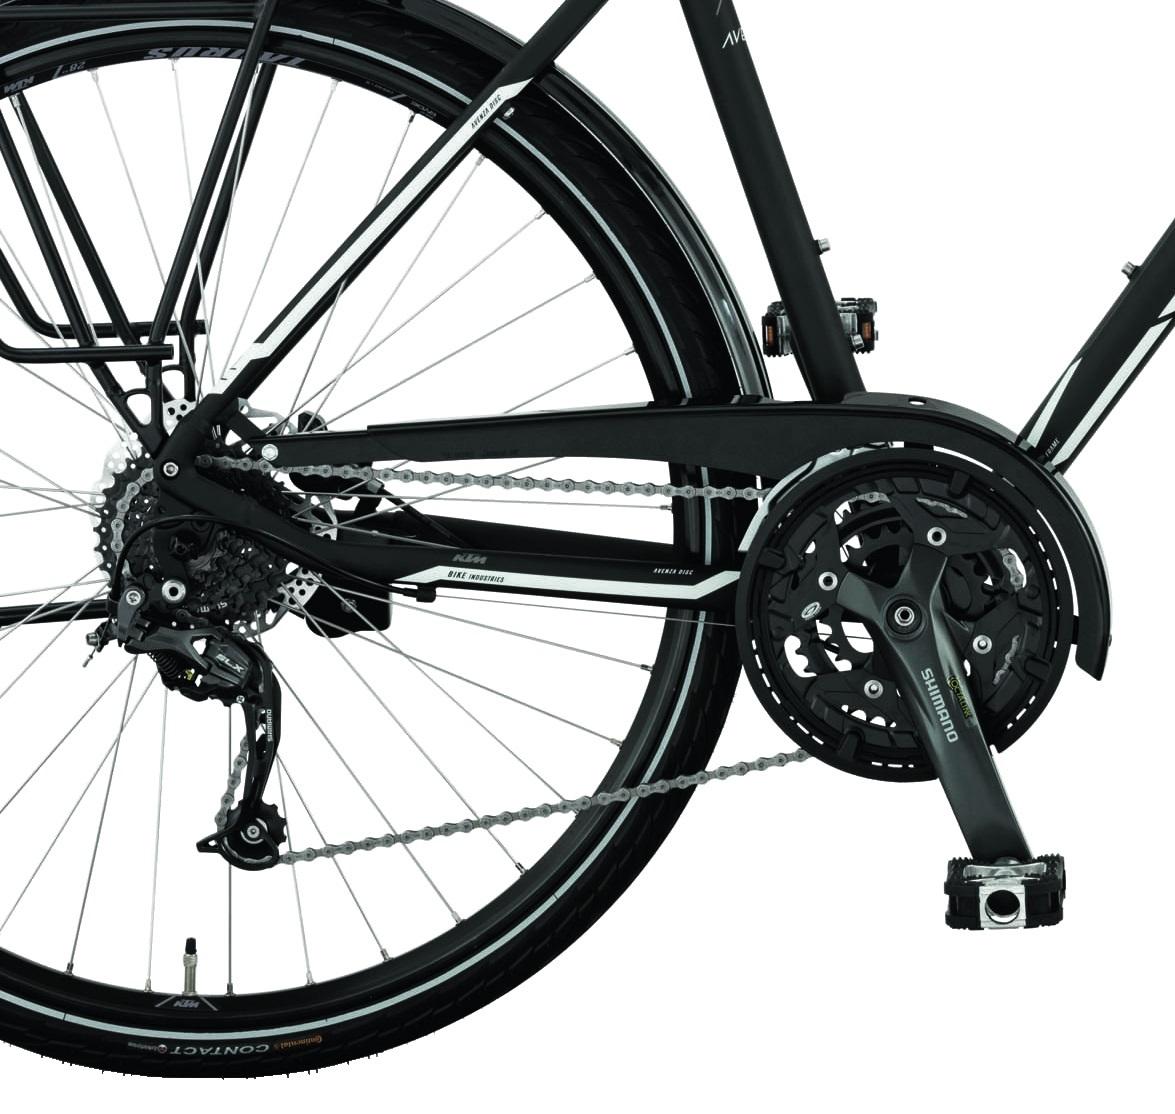 herren fahrrad ktm avenza 27 disc 2014 trekking shimano. Black Bedroom Furniture Sets. Home Design Ideas